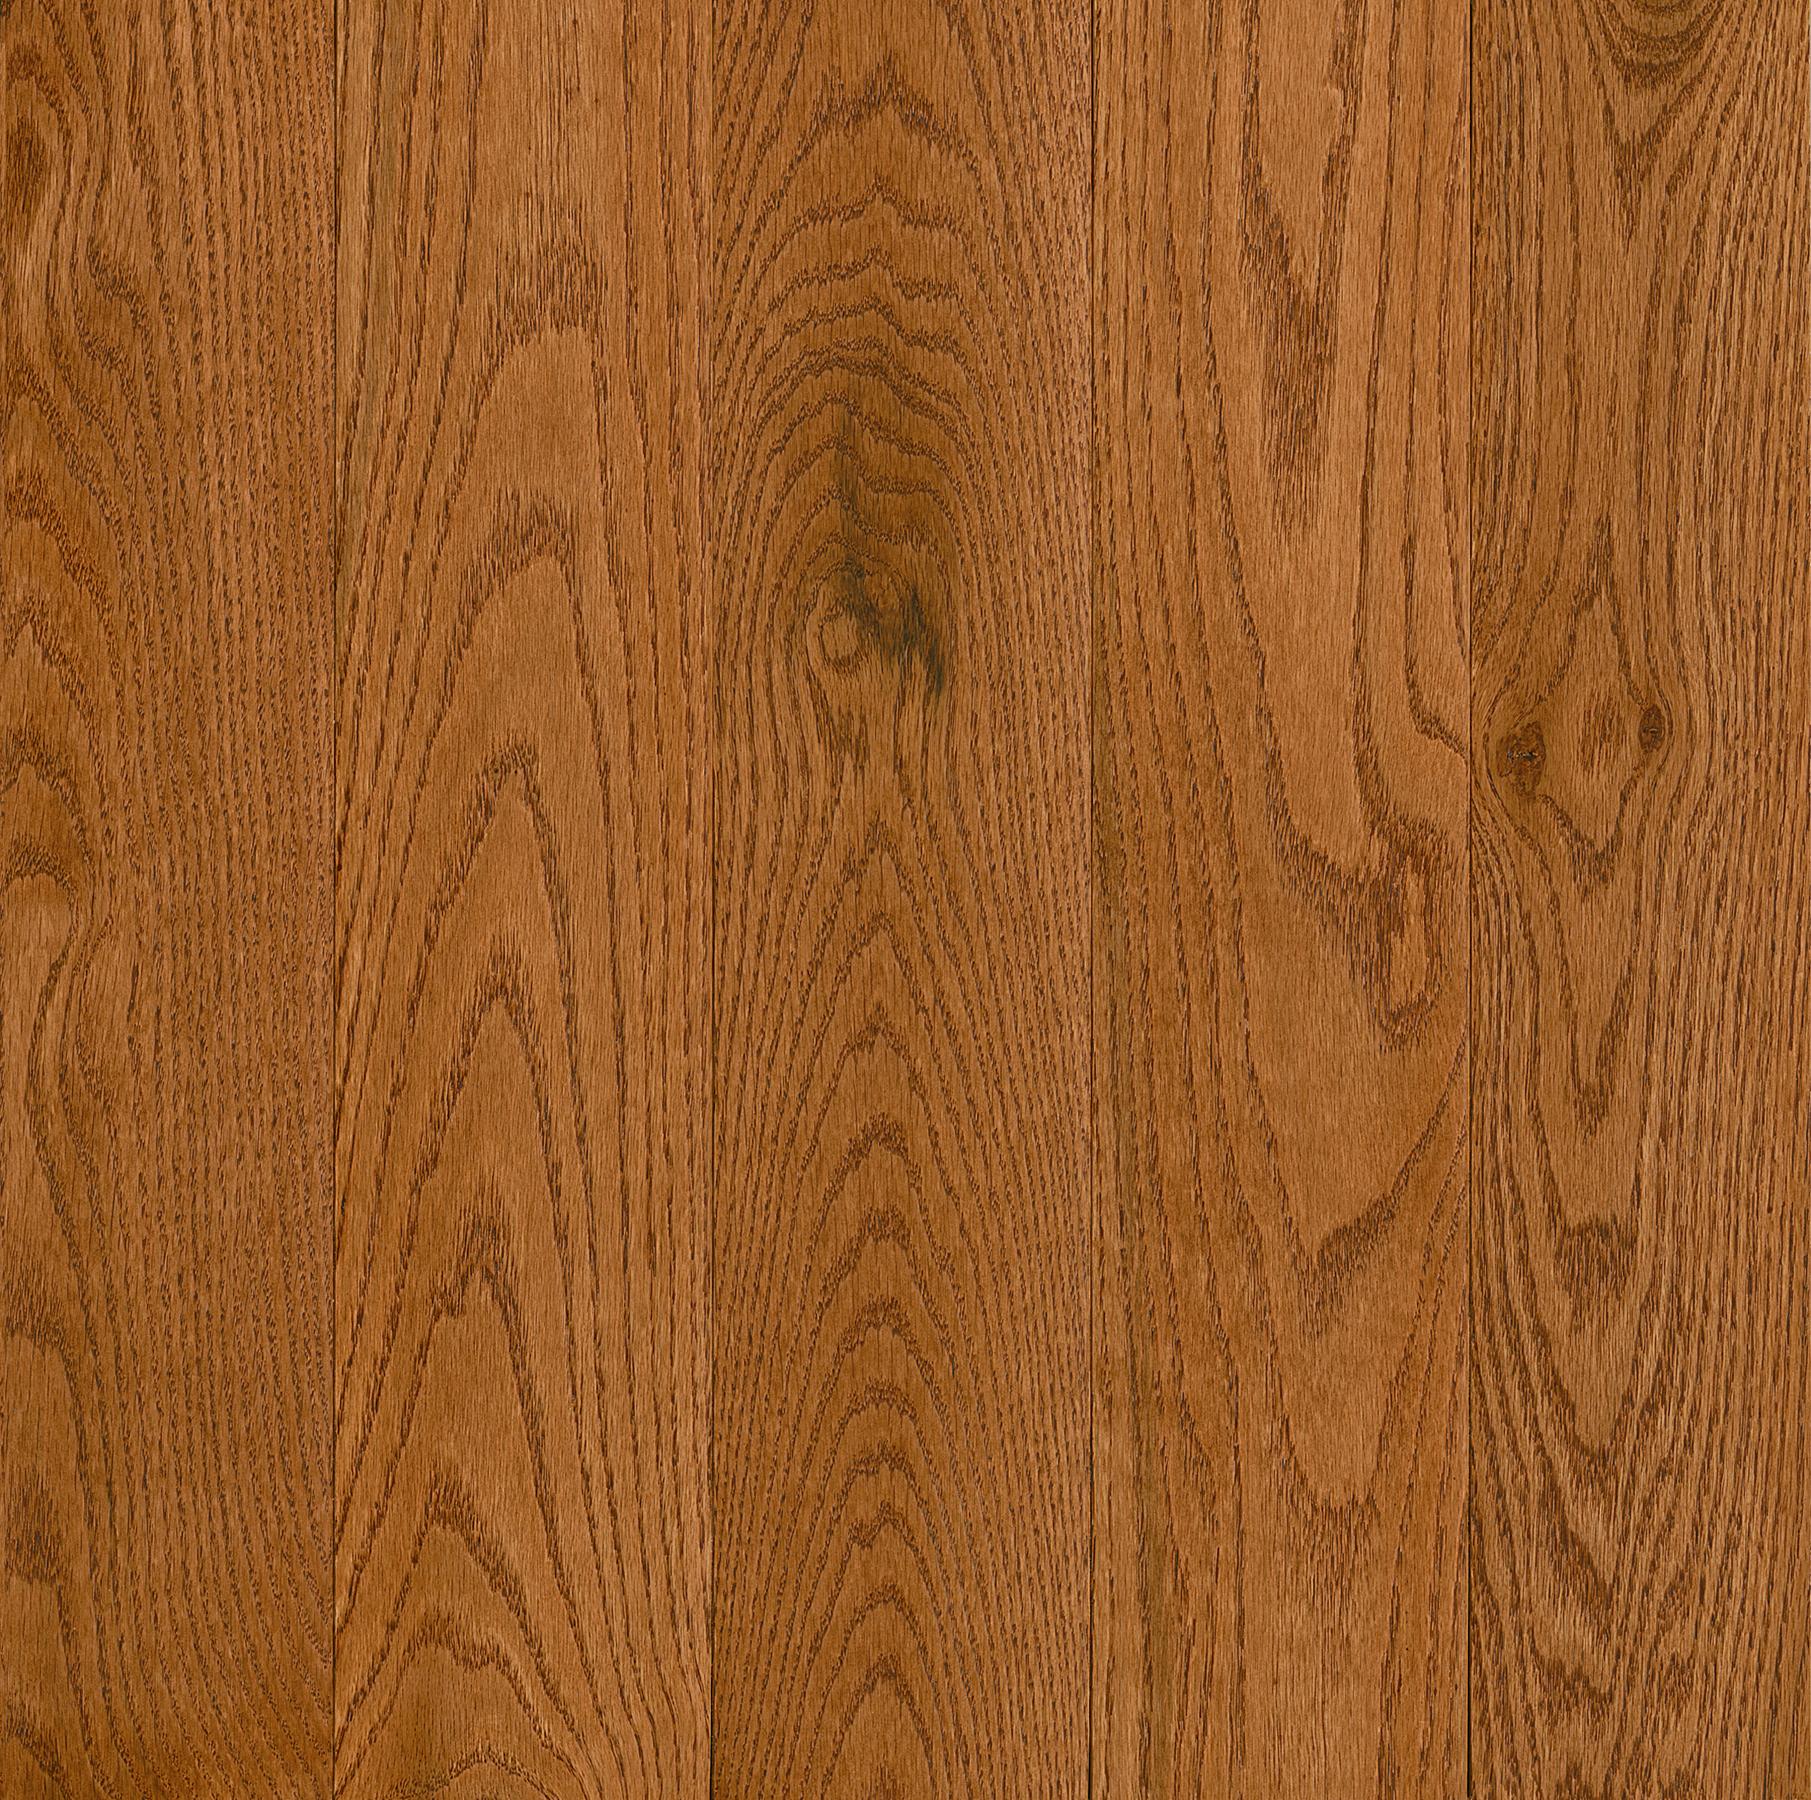 Oak Solid Hardwood Apk3411lg